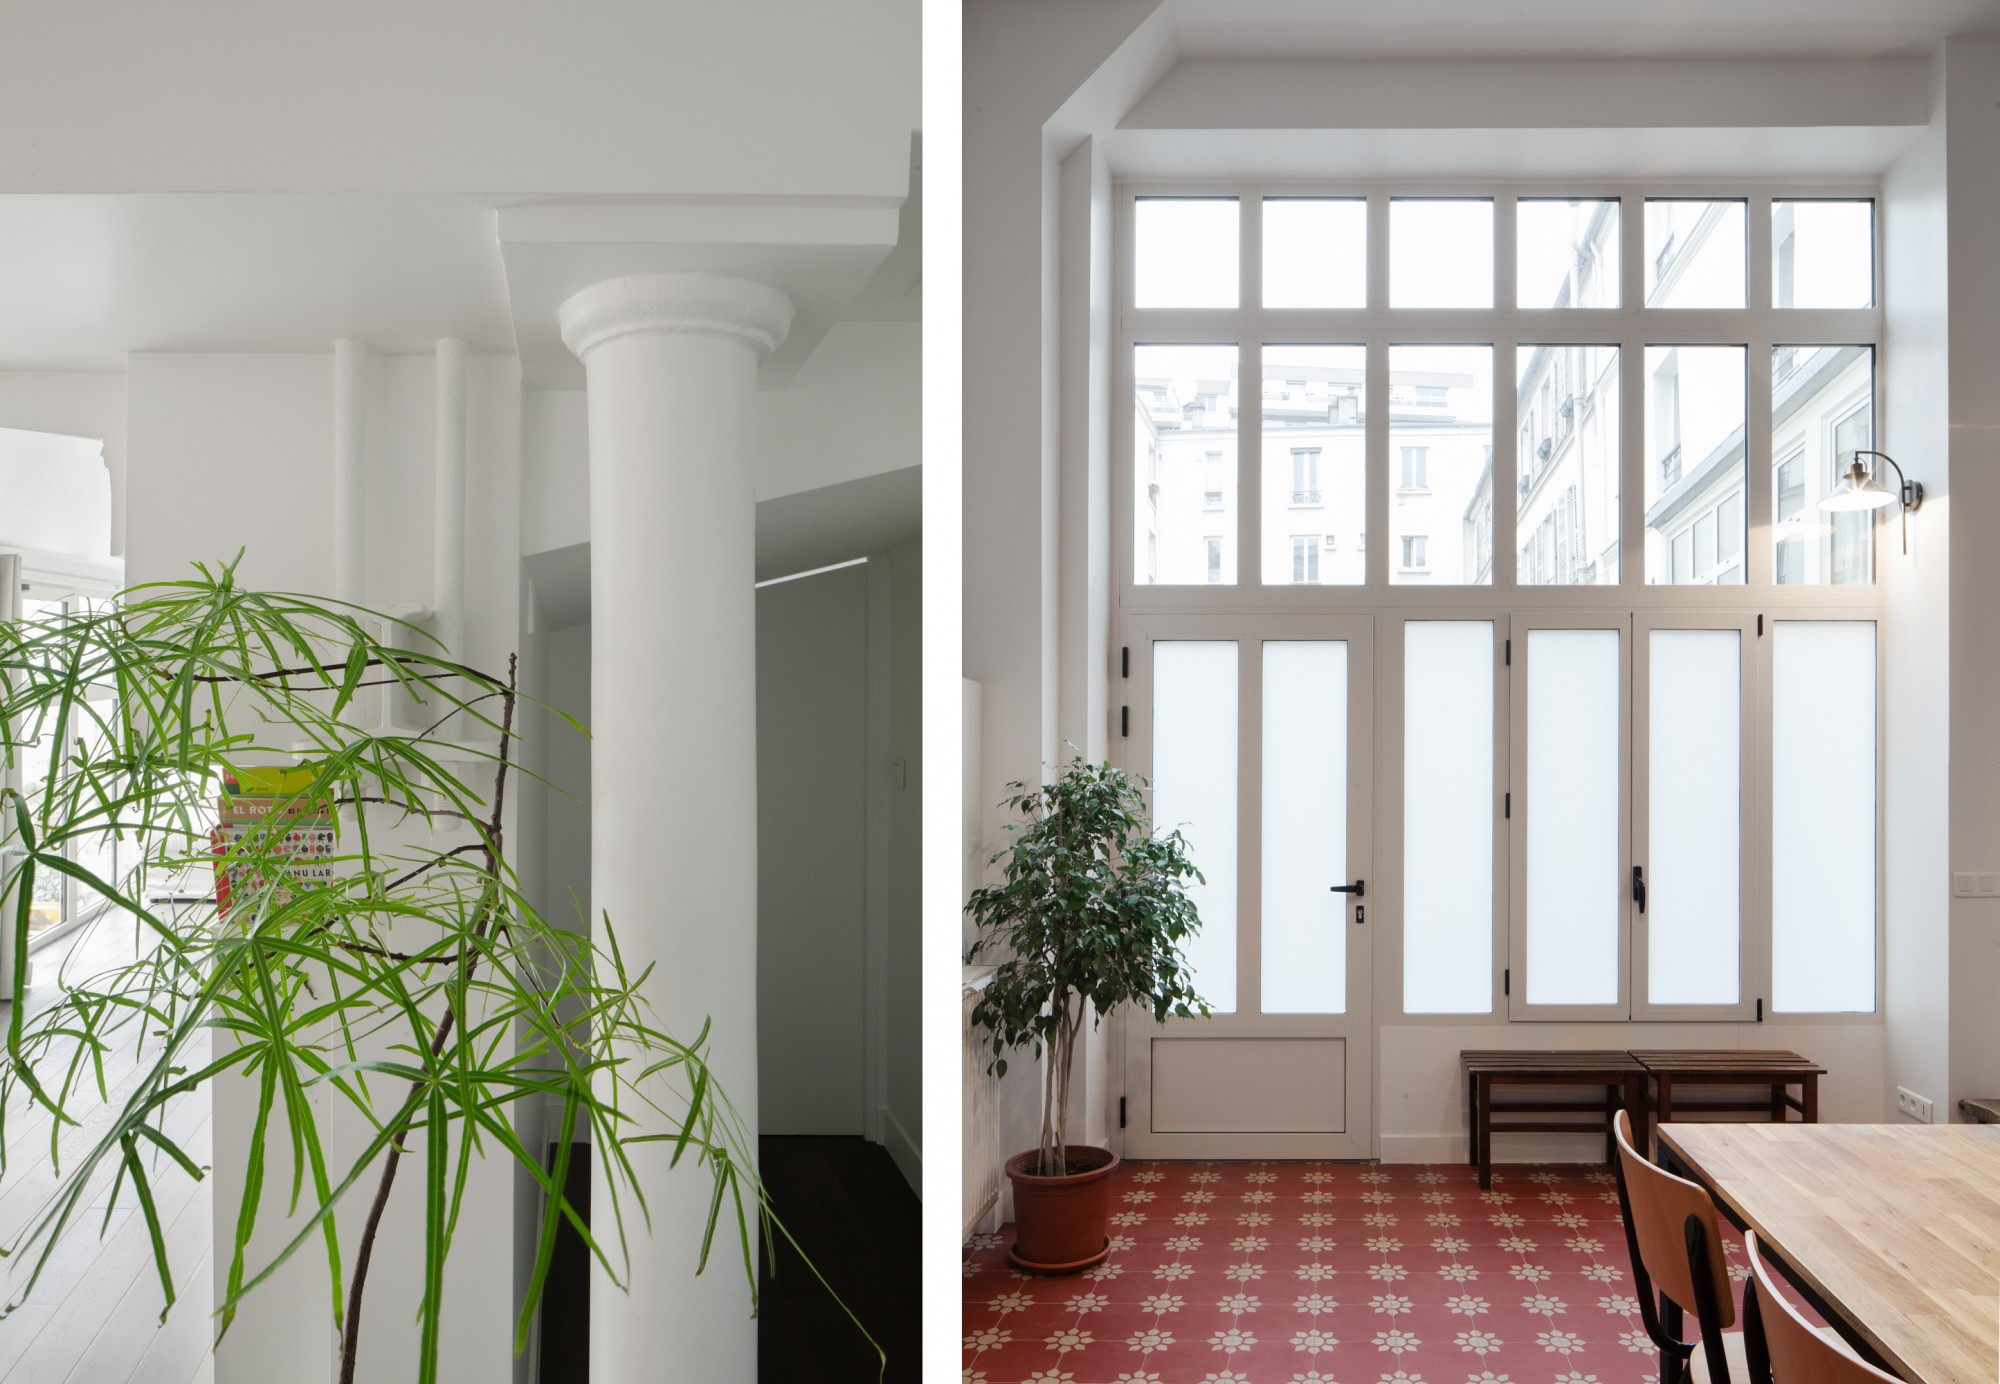 ban architecture loft oberkampf 137